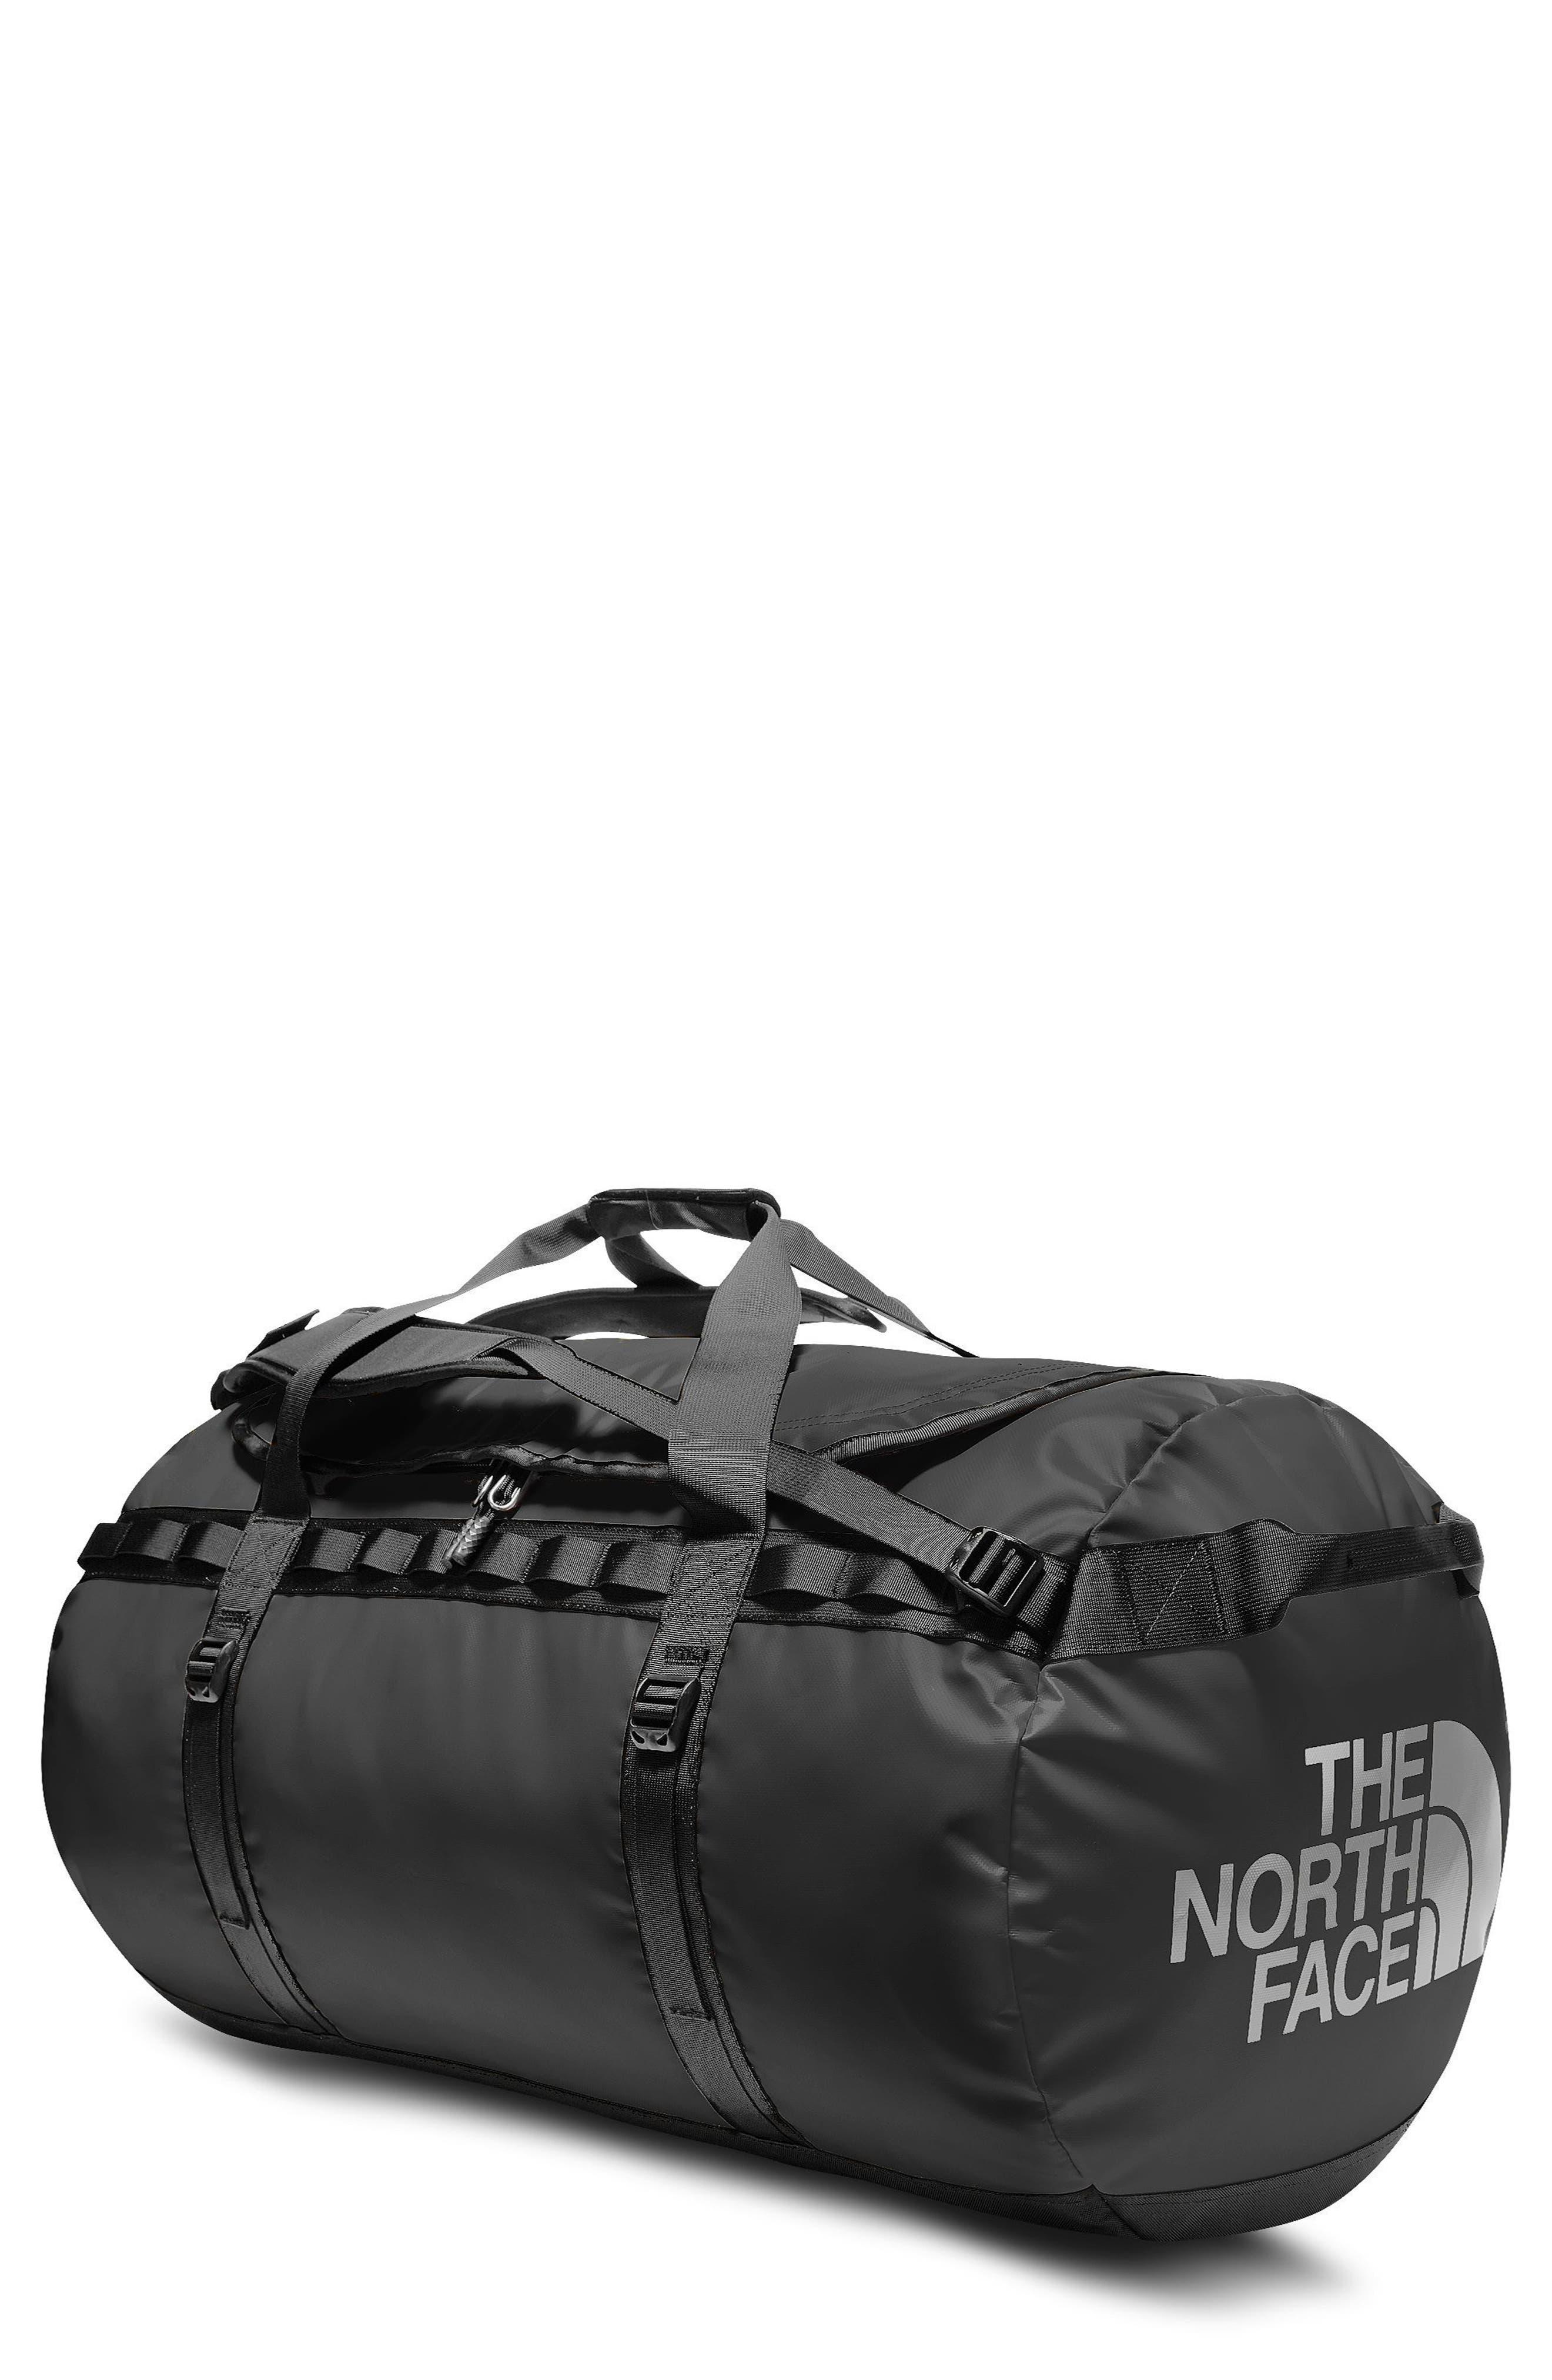 Base Camp XL Duffel Bag,                         Main,                         color, Tnf Black